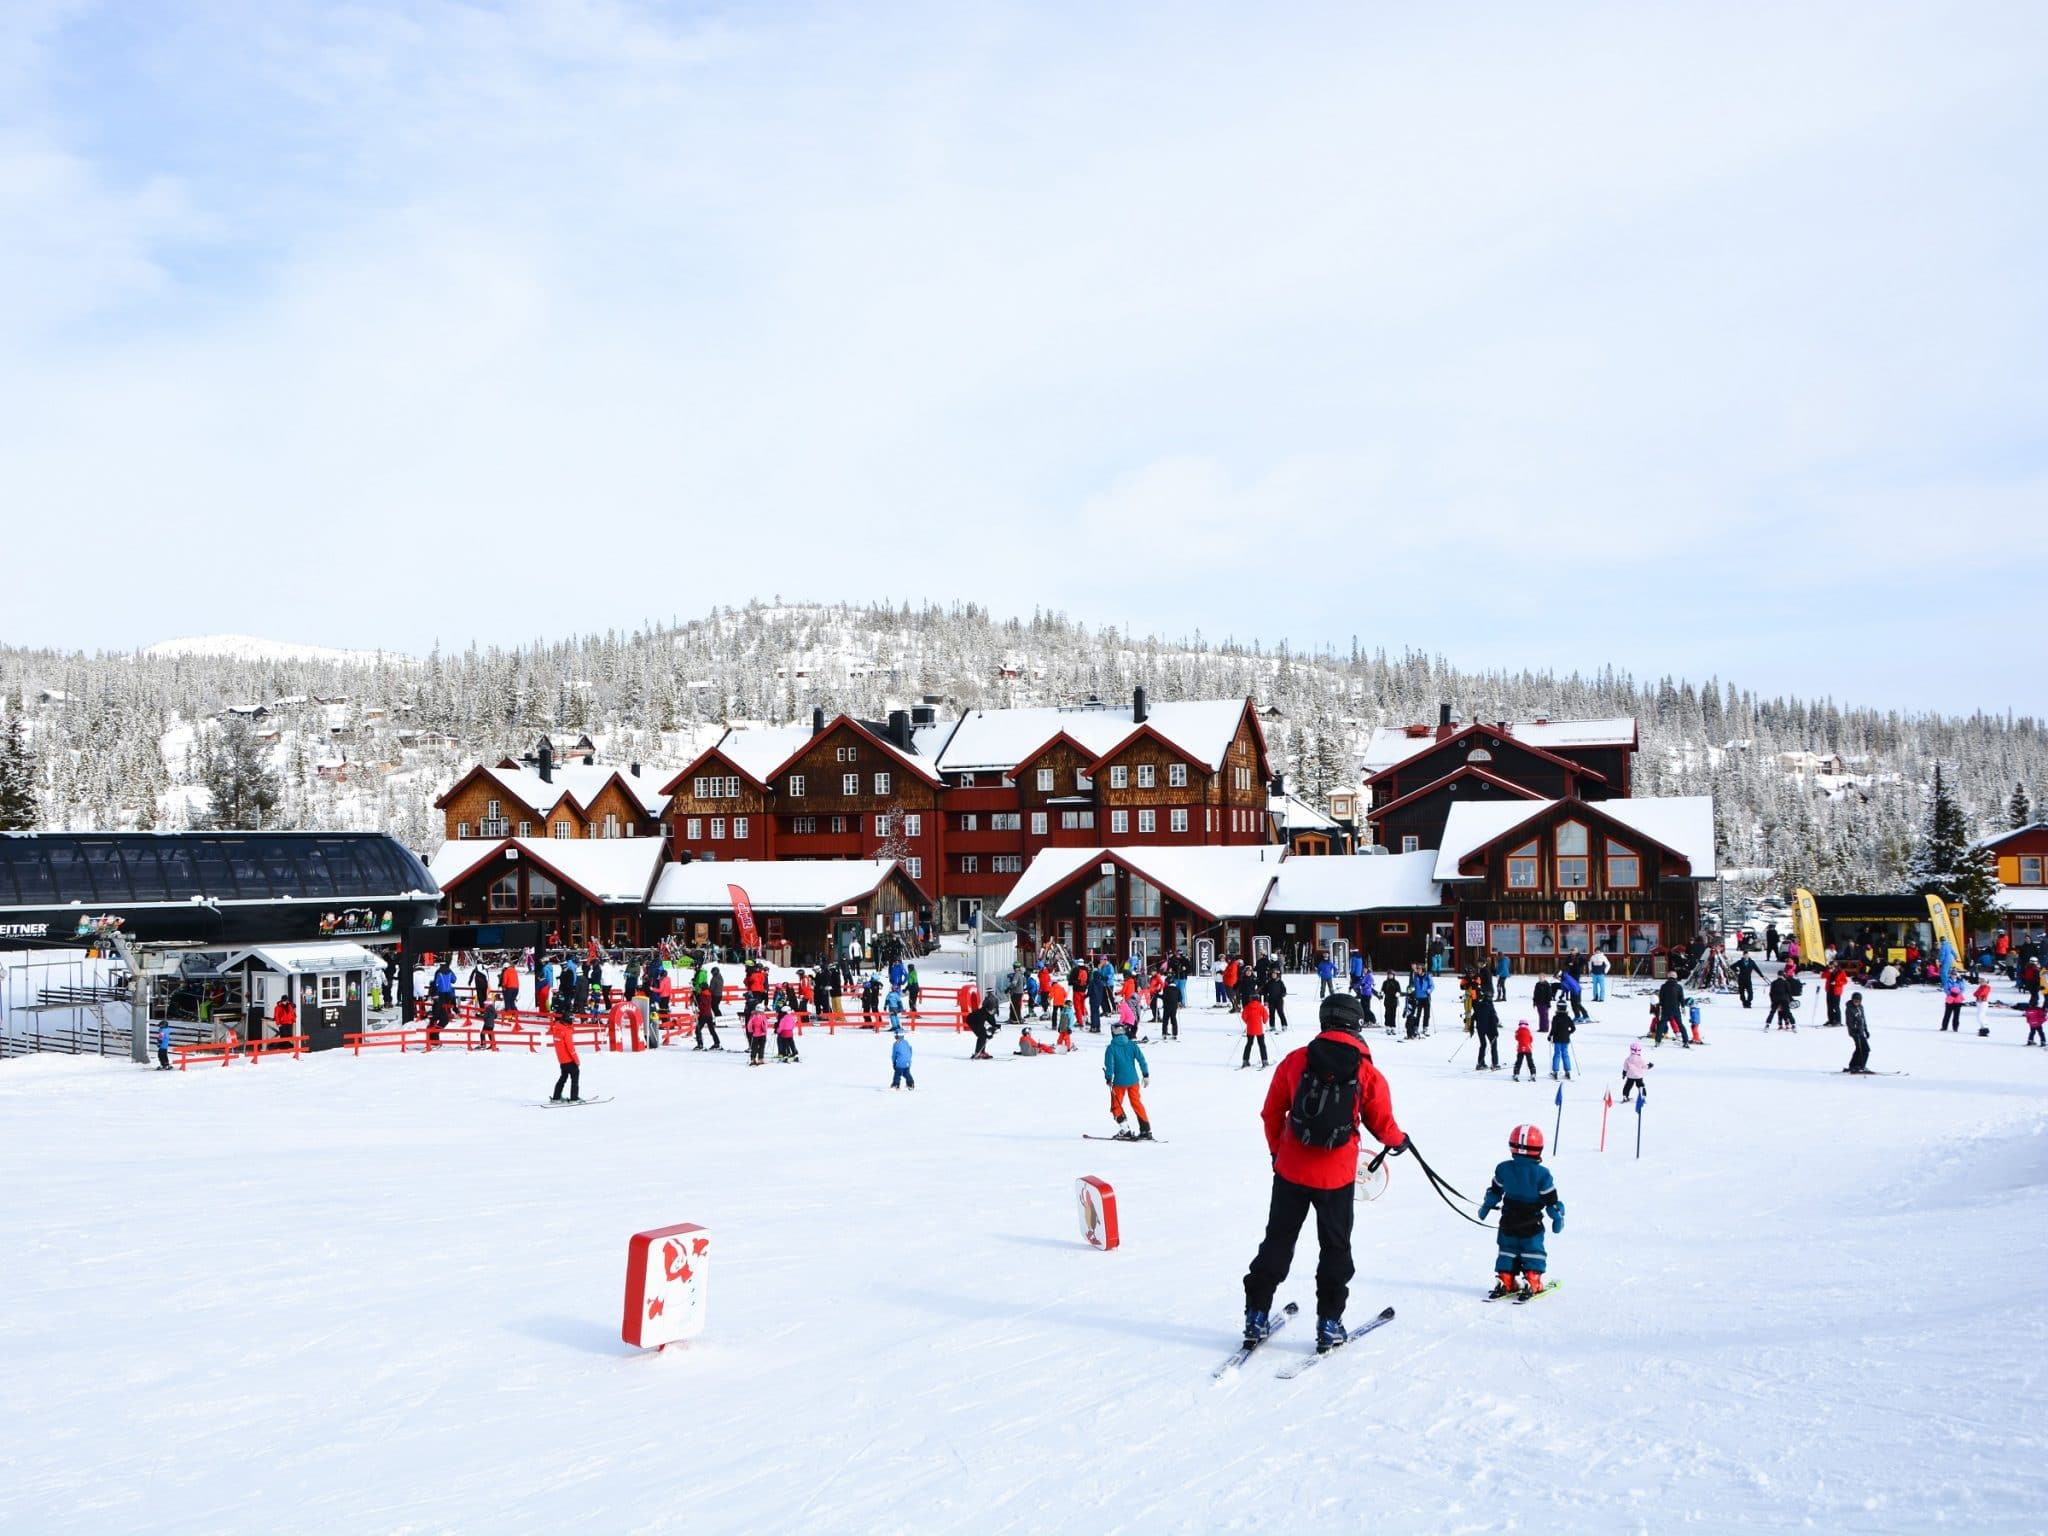 Skier on the Vemdalsskalet